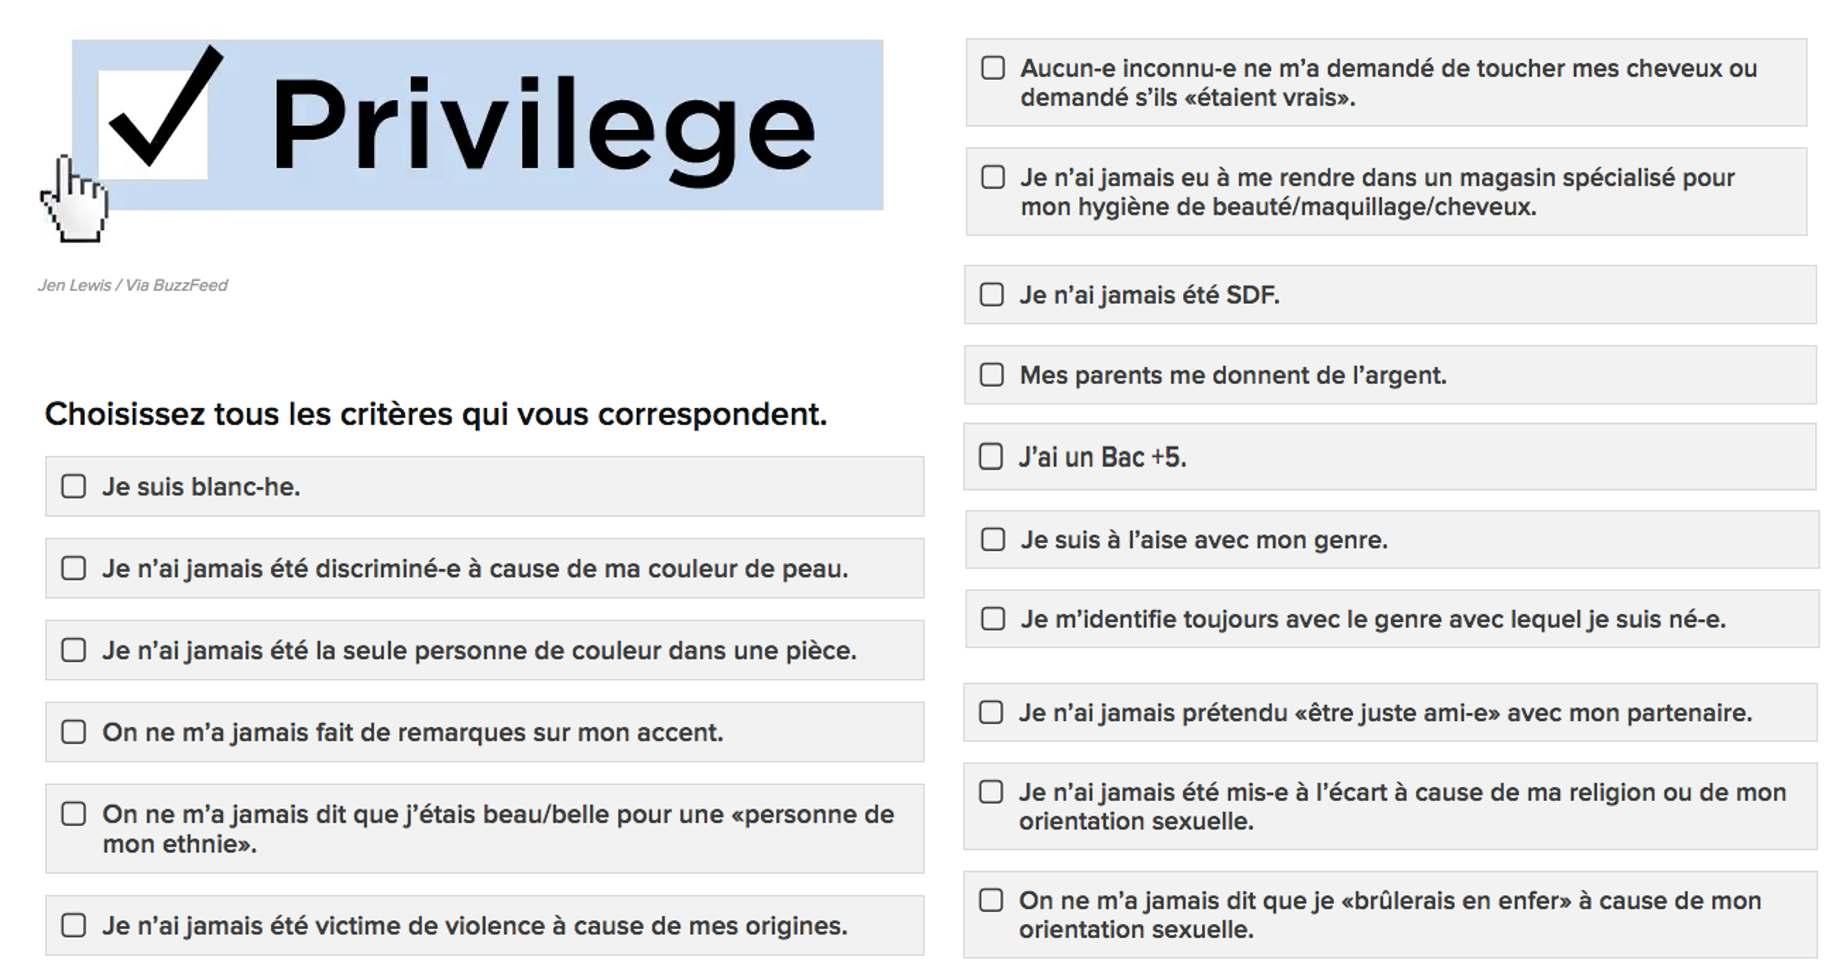 Check tes privilèges